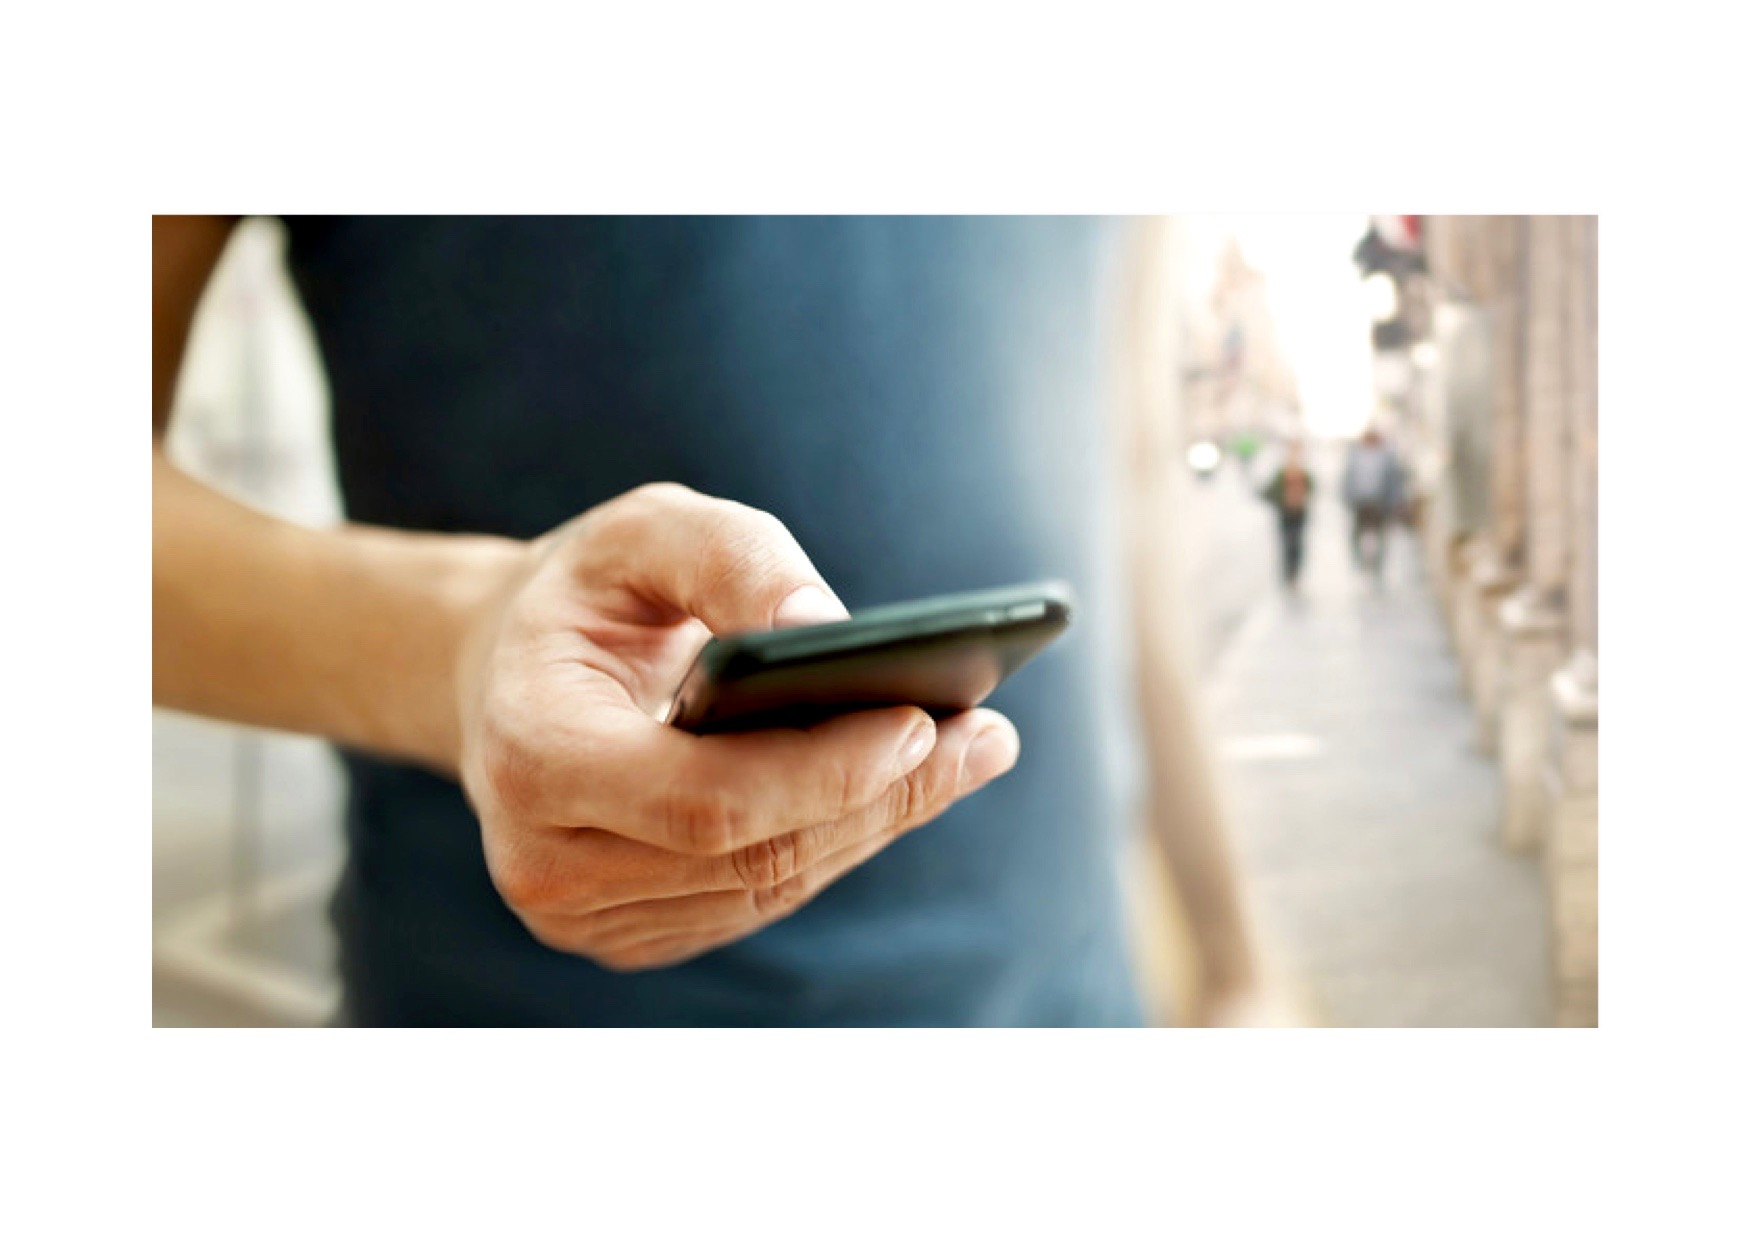 Sms'jes aan burgerhulp kunnen duizenden levens redden